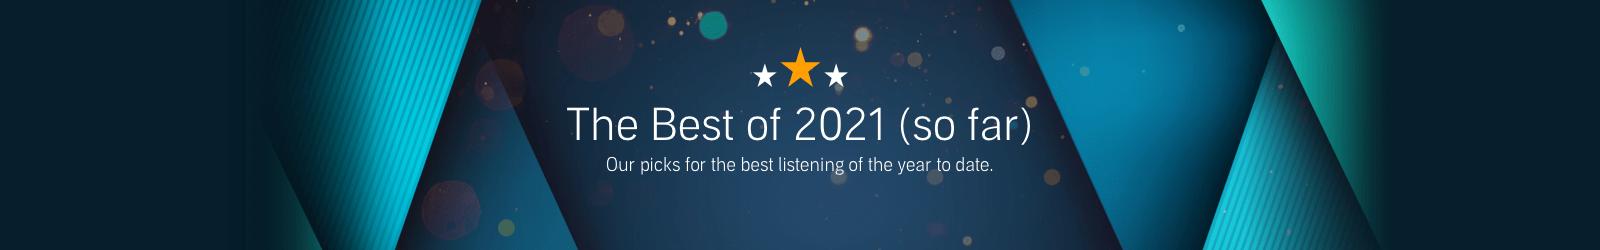 The best audiobooks of 2021